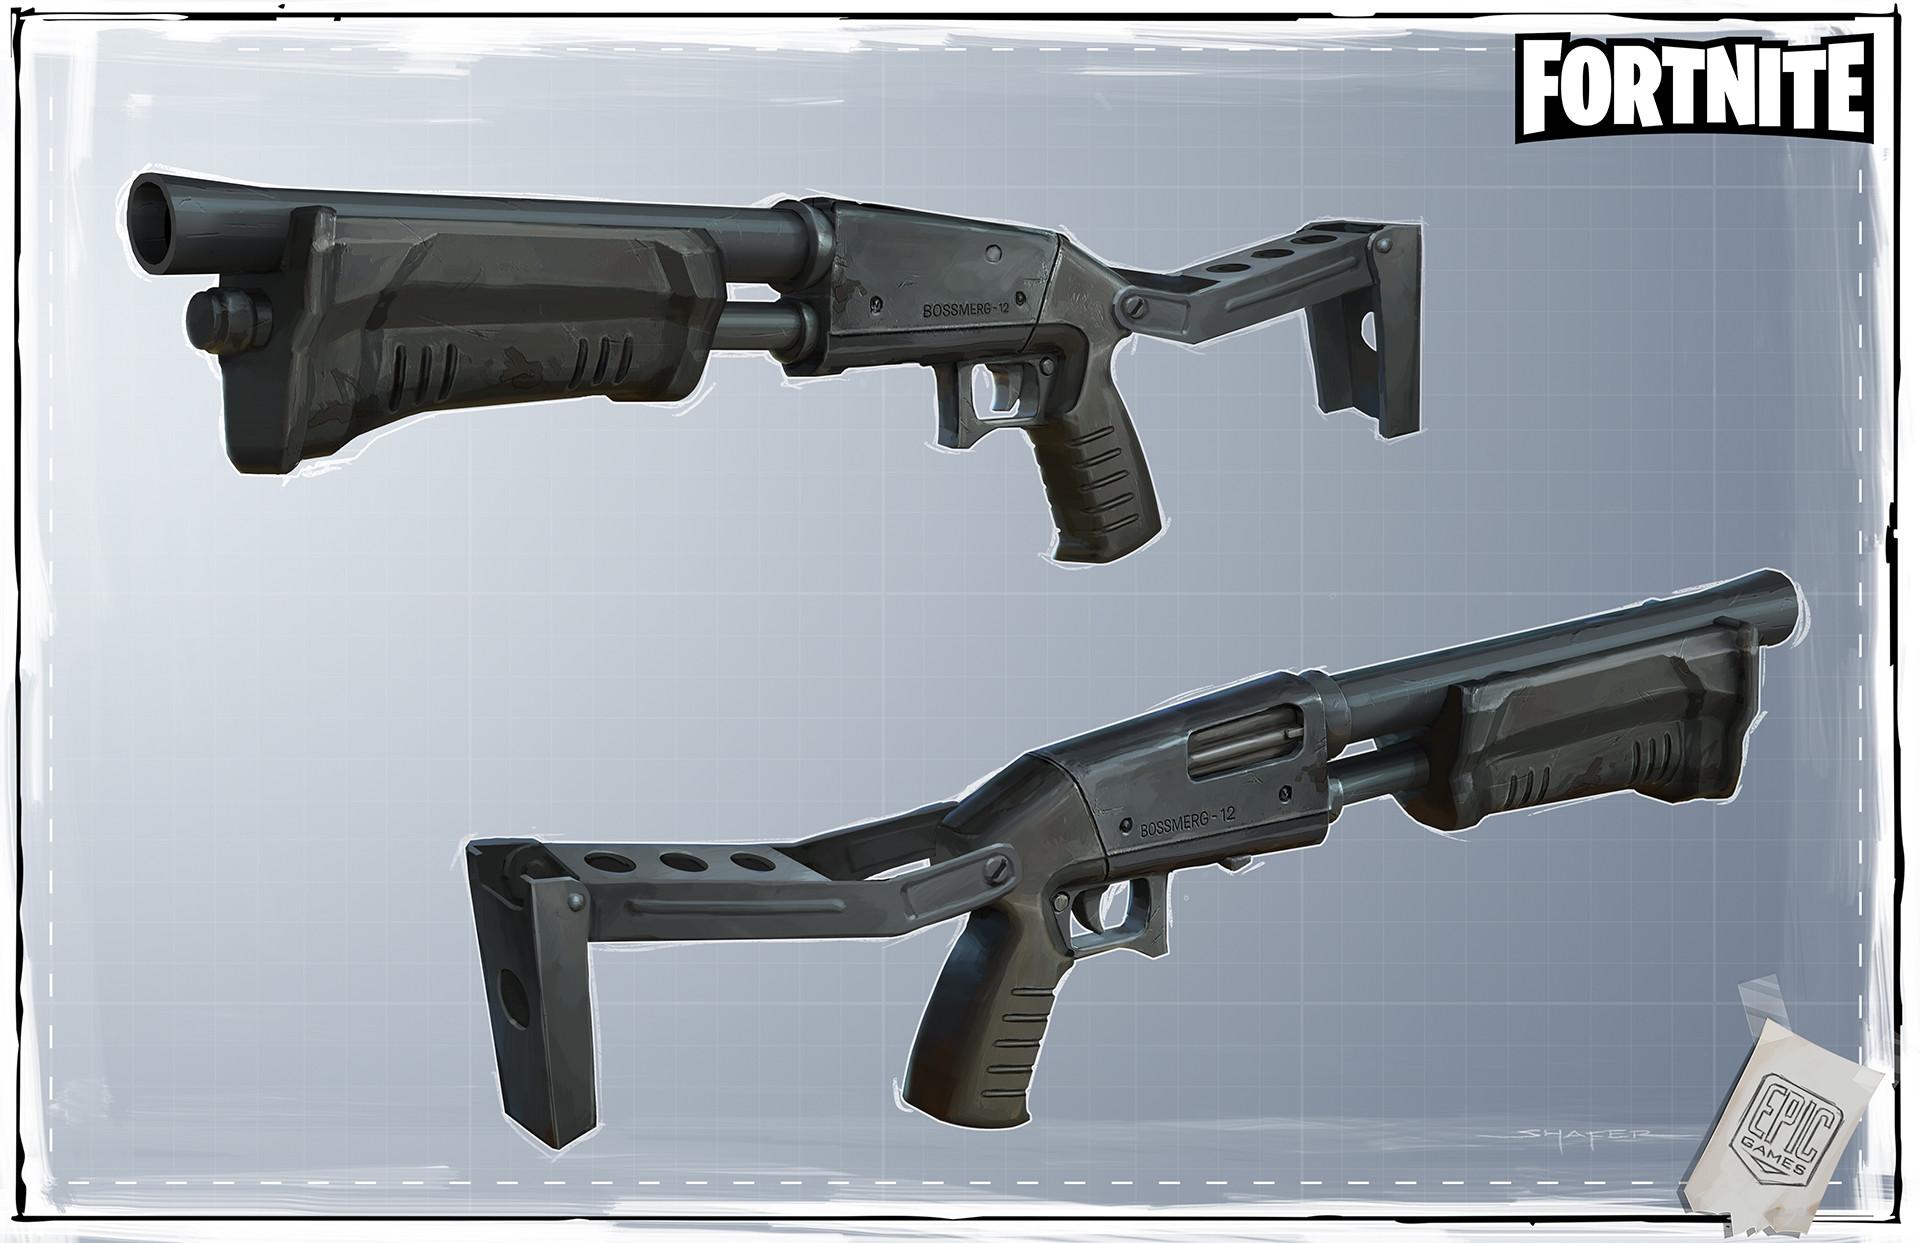 Ben shafer d fortnite weapons firearms shotty longarm enforcer layout longarm enforcer sheet 3 5